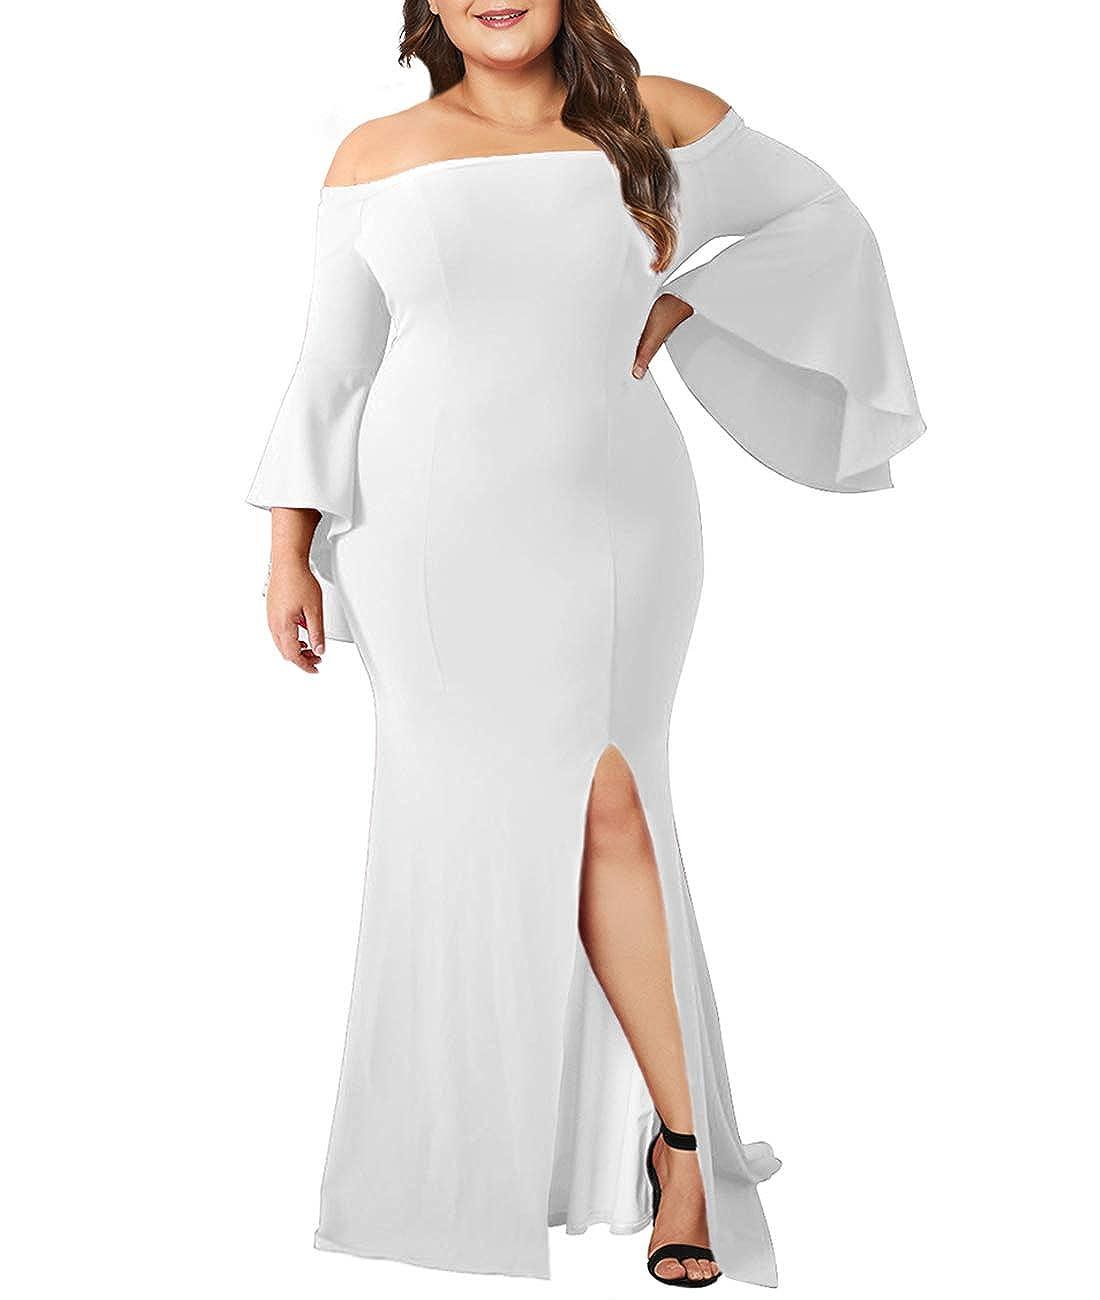 070299242f Lalagen Women s Plus Size Off Shoulder Bodycon Long Evening Party Dress Gown